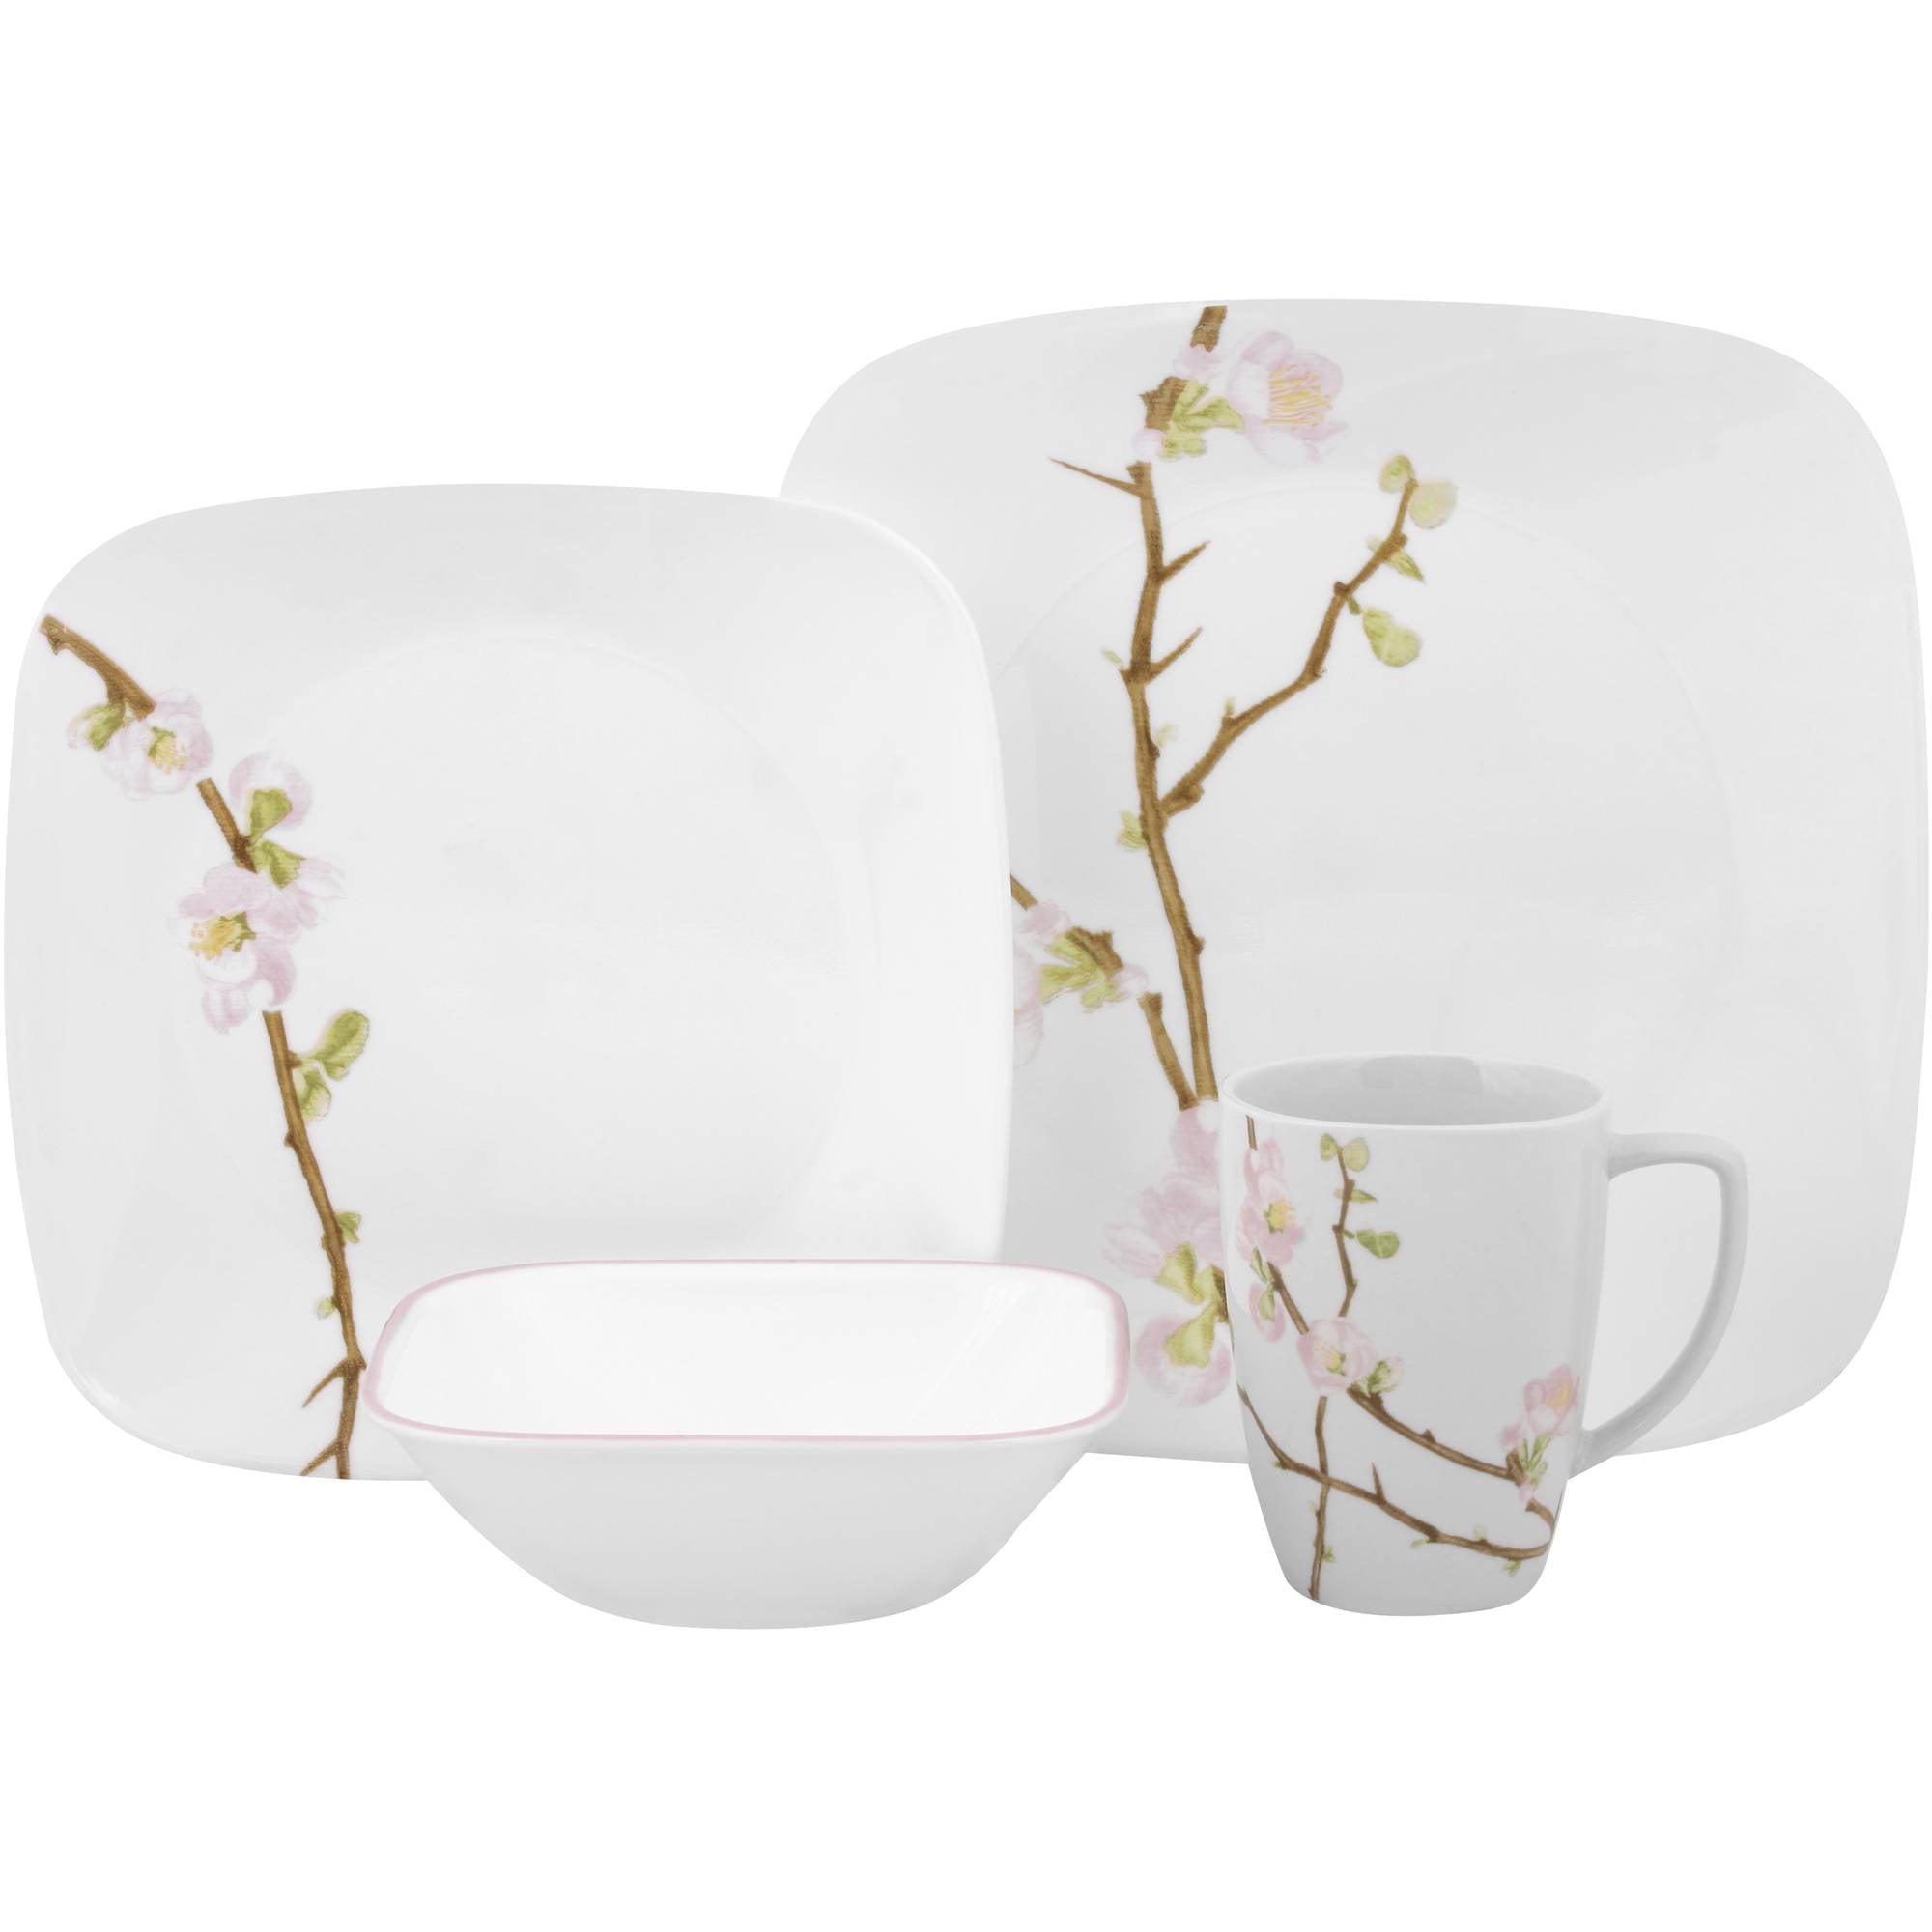 Corelle Square Round 16-Piece Dinnerware Set Cherry Blossom - Walmart.com  sc 1 st  Walmart & Corelle Square Round 16-Piece Dinnerware Set Cherry Blossom ...